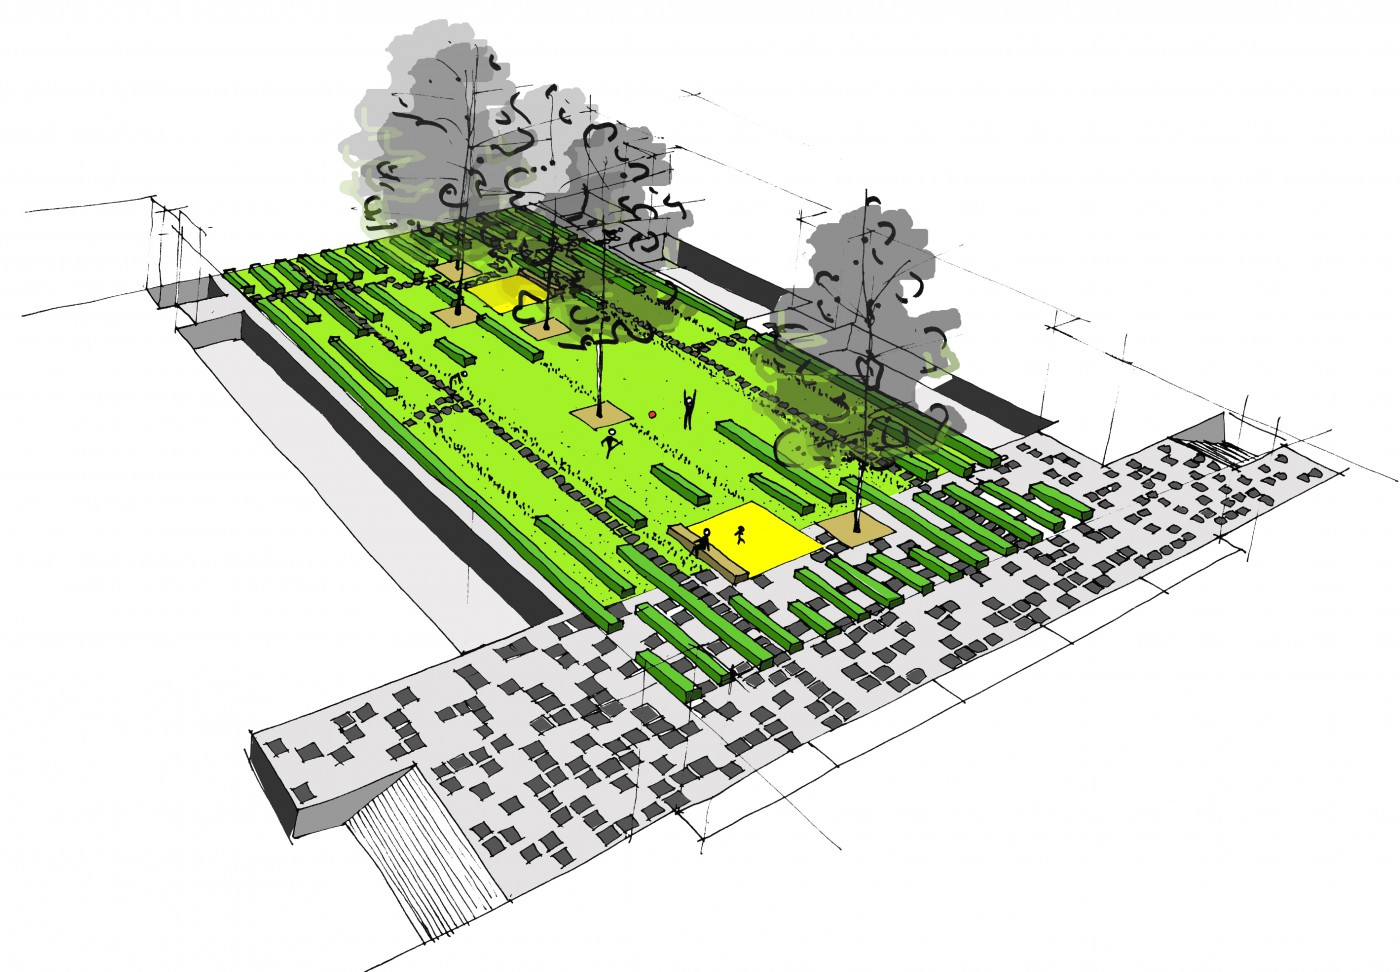 buro-sant-en-co-landschapsarchitectuur-Masira-Amsterdam-Hof-B